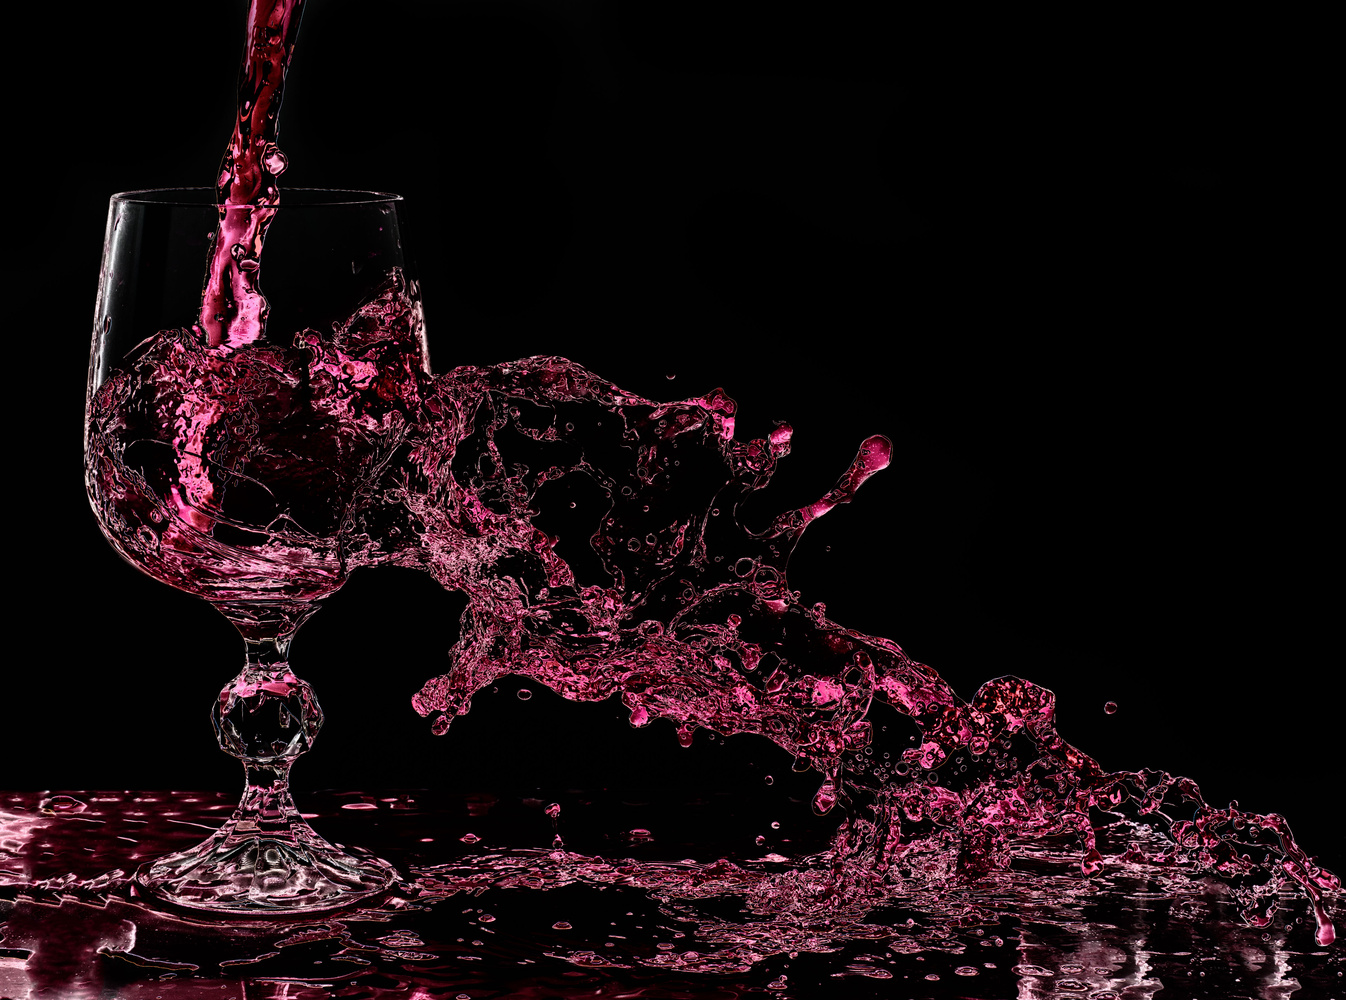 Splash! by Burt Johnson